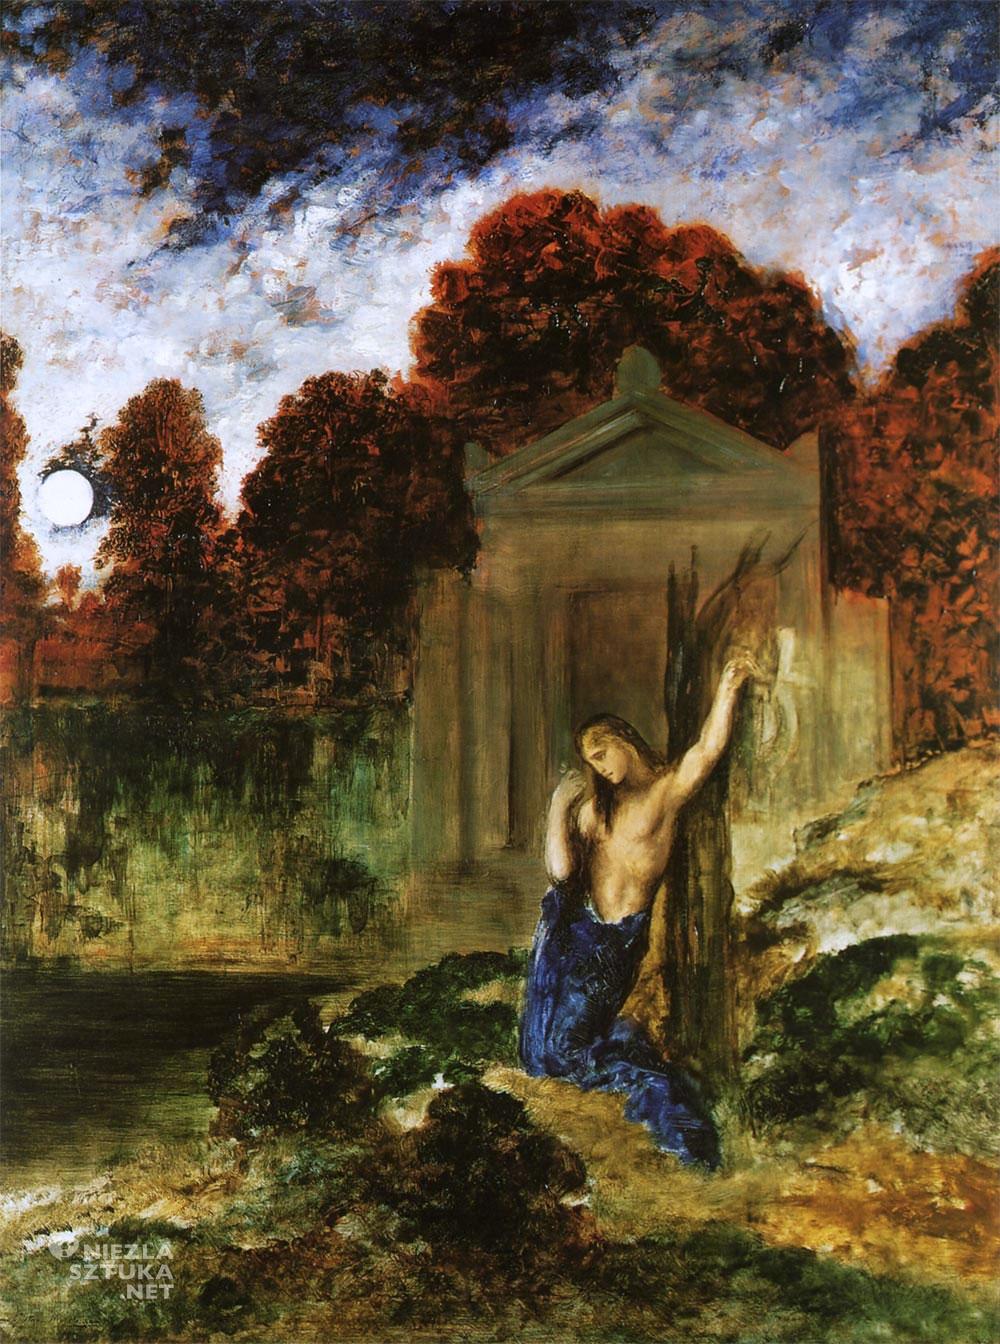 Gustave Moreau, Orfeusz przy grobie Eurydyki, Eurydyka, Niezła sztuka